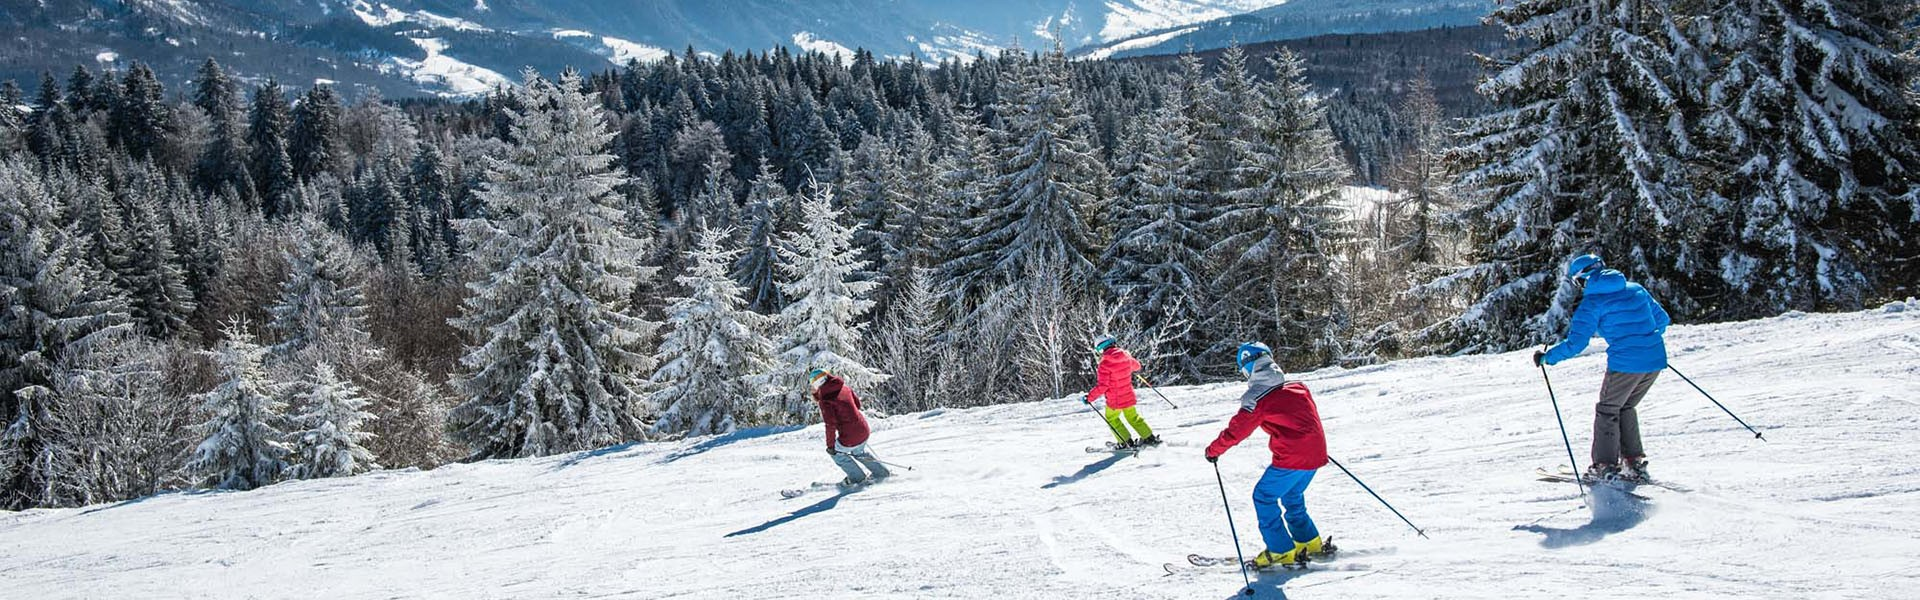 homesgr-ski-alpin-famille-2018-la-feclaz-bd-savoie-grand-revard-peignee-verticale-t-nalet-jpg-10-412